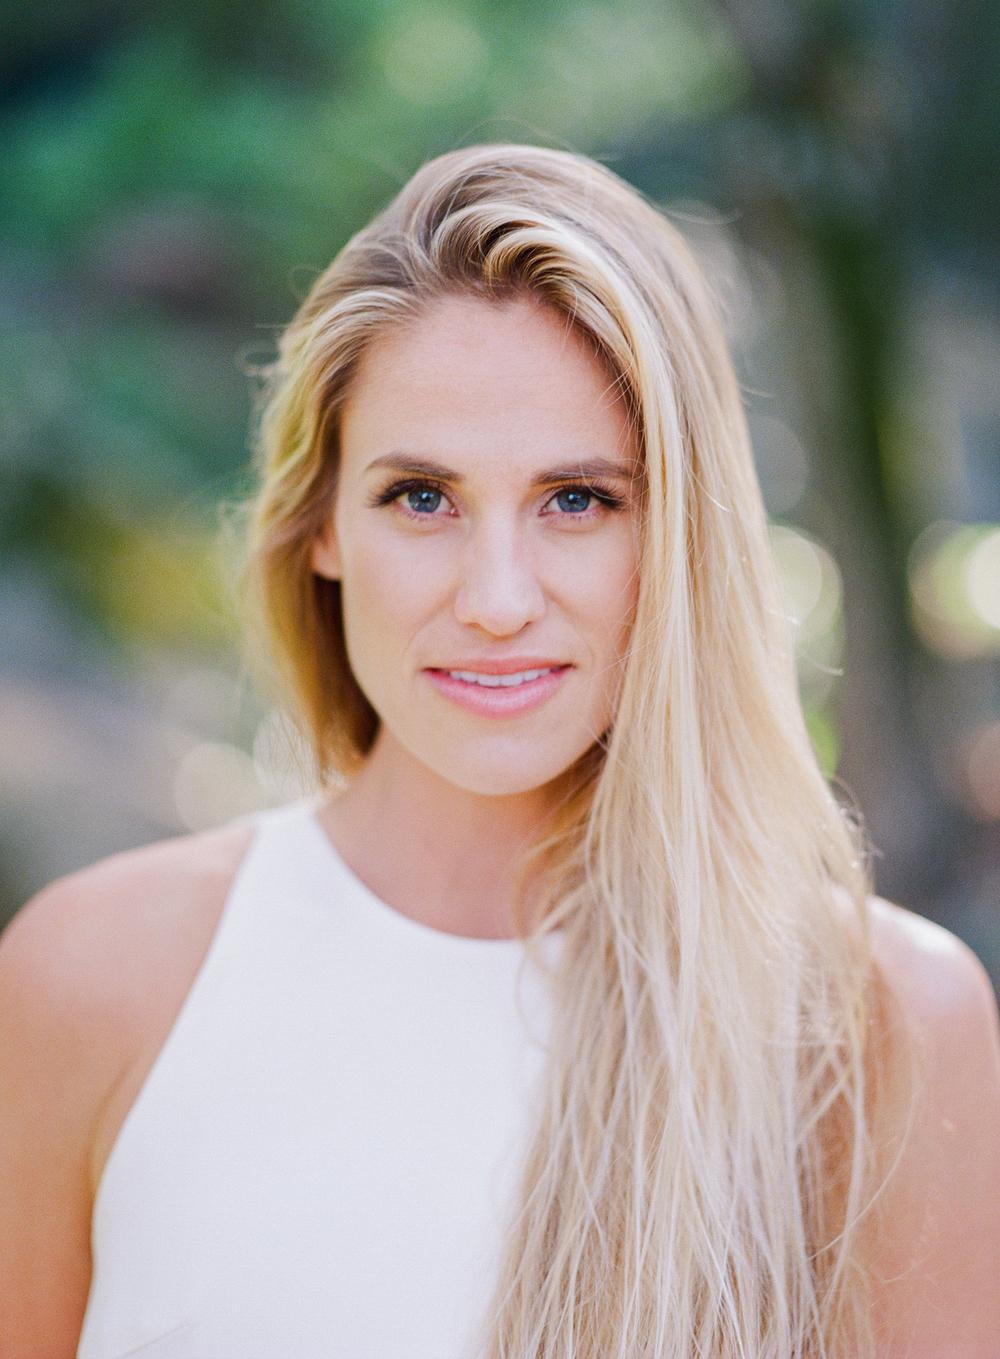 005-Jen-Wojcik-Photography-San-Diego-Photographer.jpg